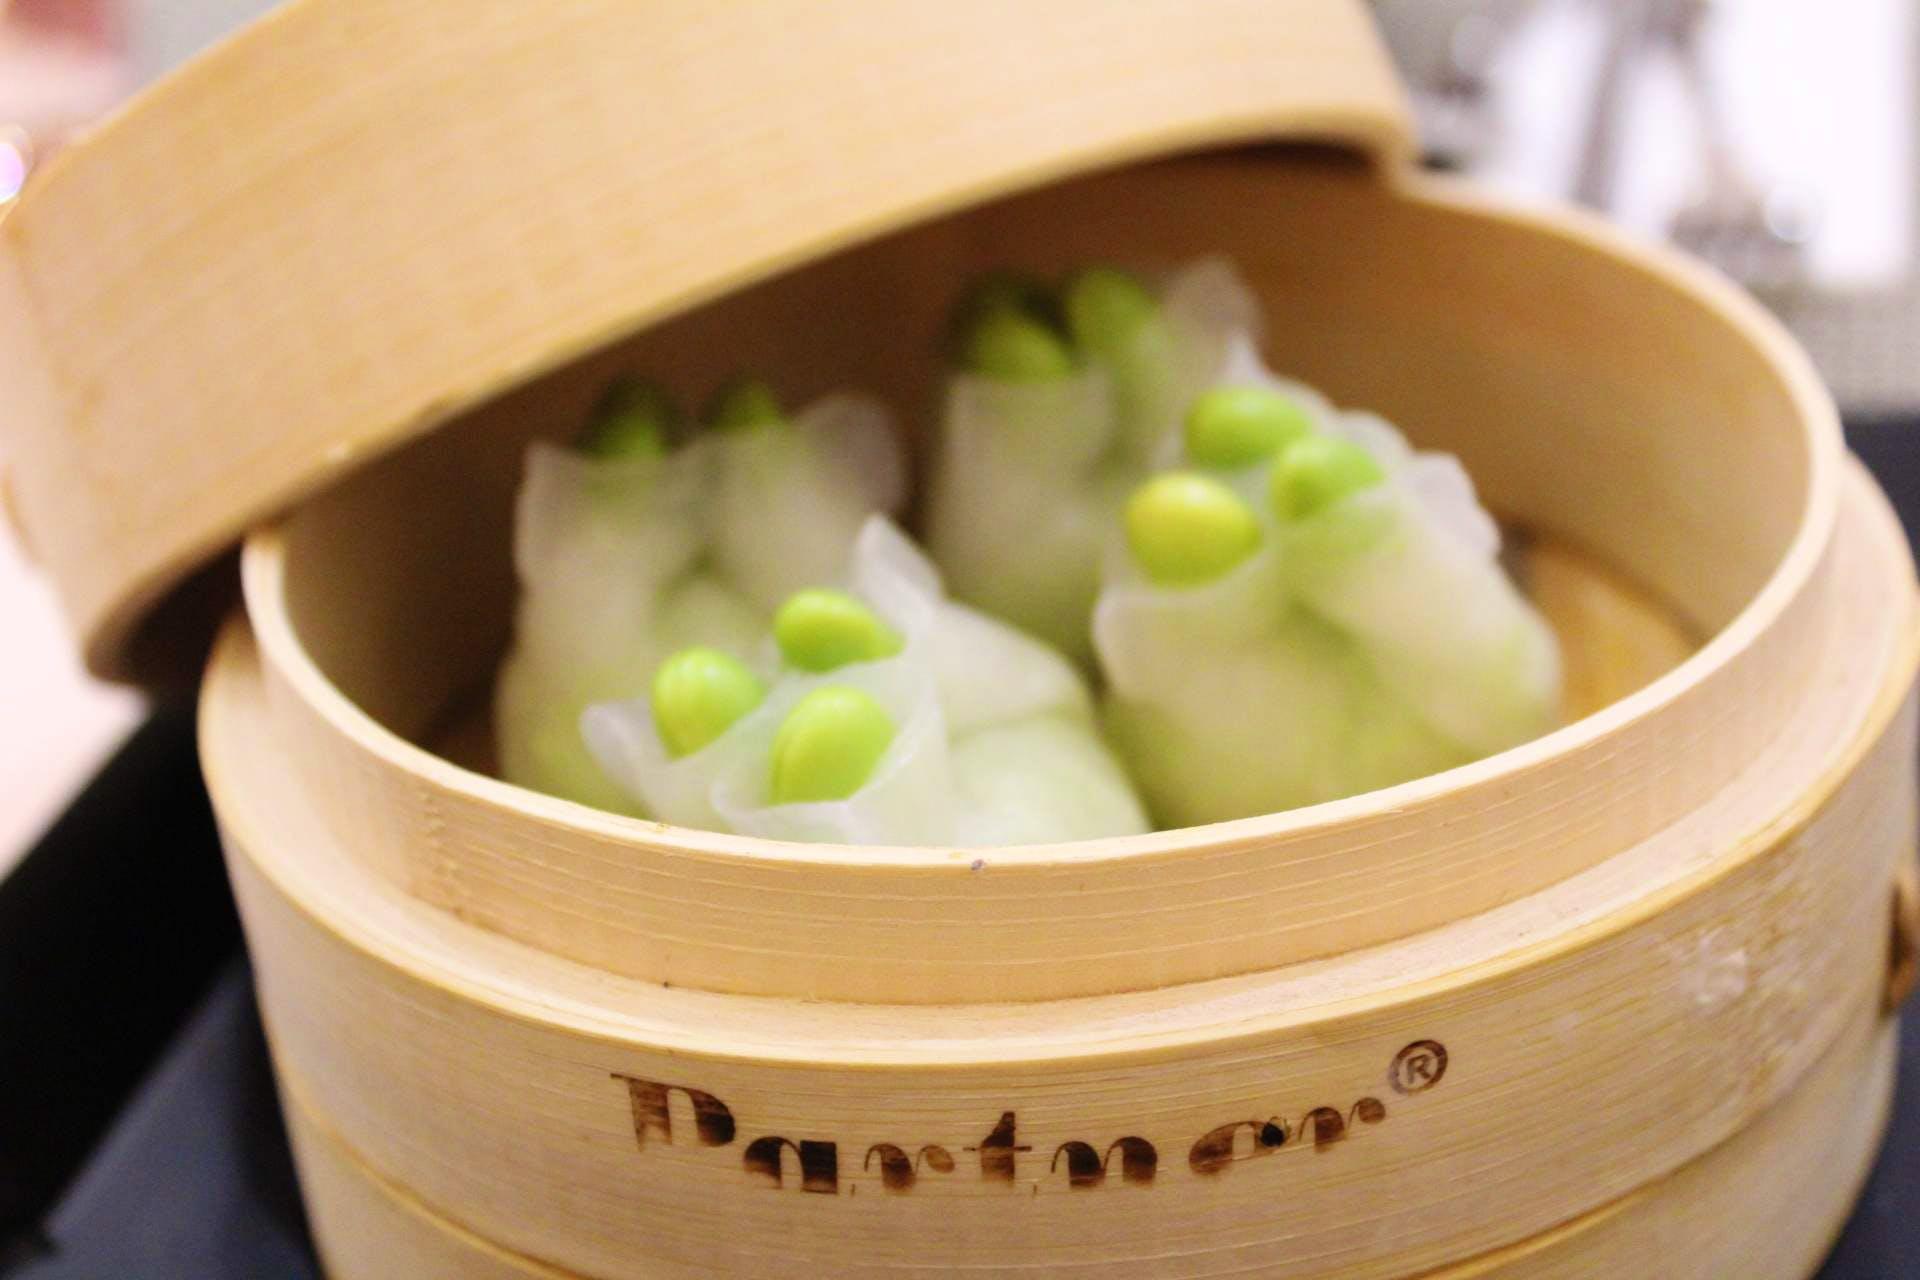 Dim sum,Food,Dish,Cuisine,Jiaozi,Food steamer,Shumai,Ingredient,Chinese food,Dumpling